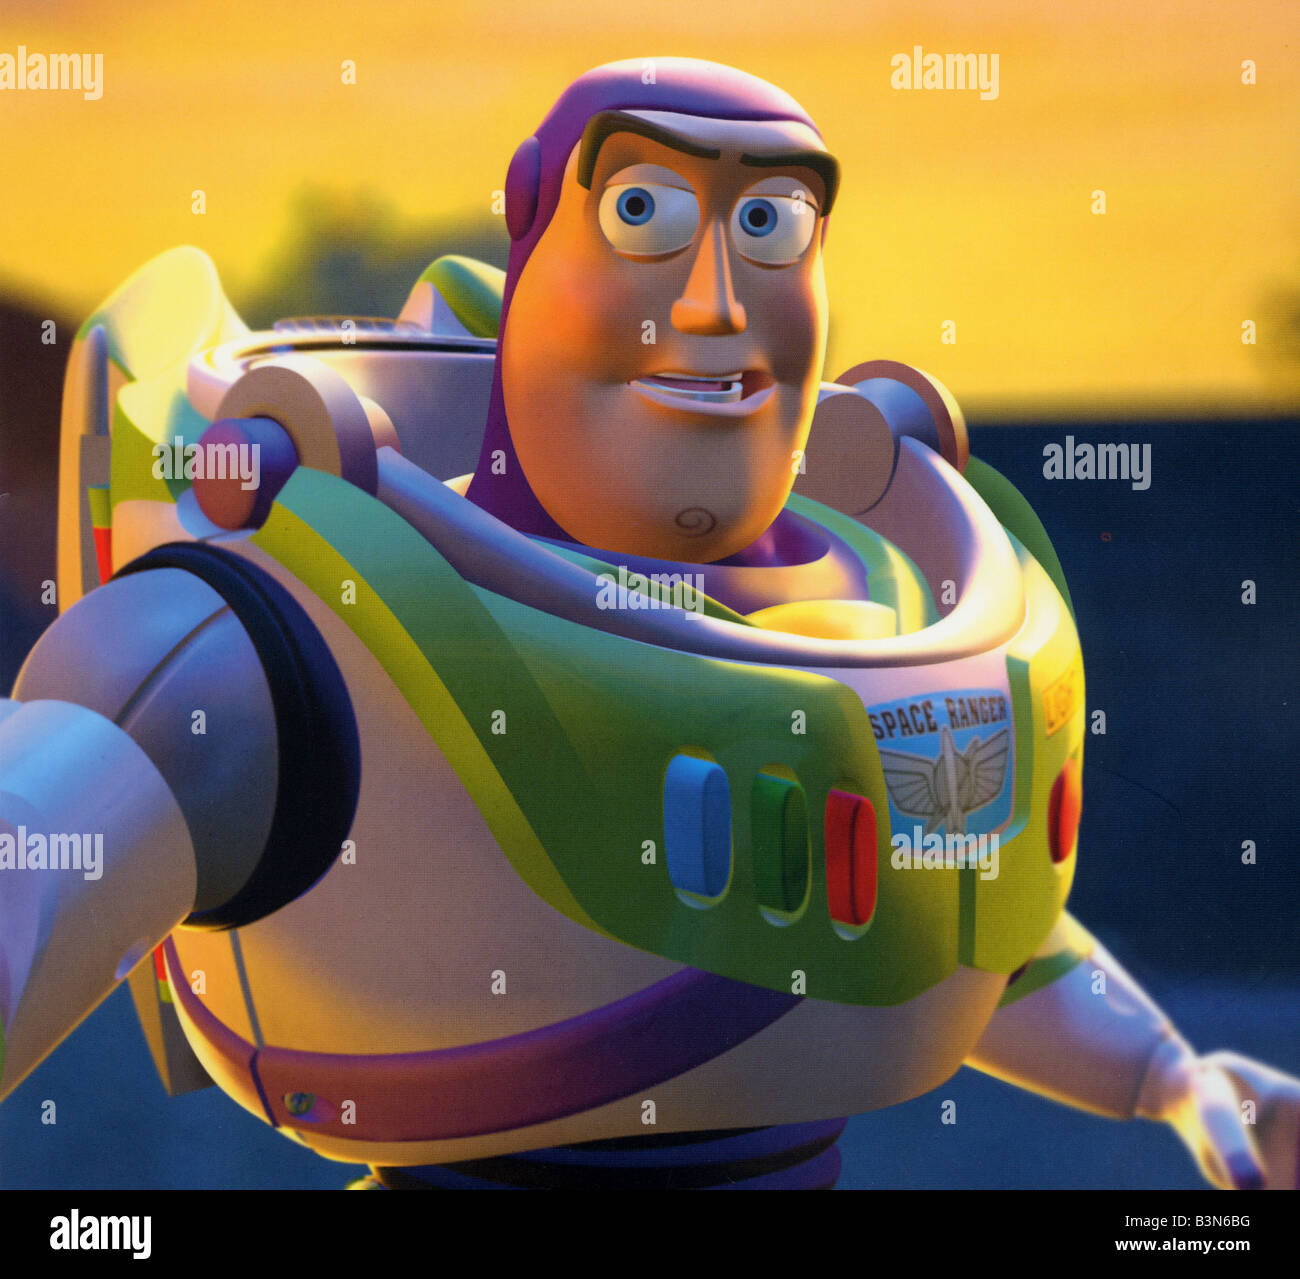 TOY STORY 1995 Buena Vista/Walt Disney/Pixar animated film with Buzz Lightyear voiced by Tim Allen - Stock Image